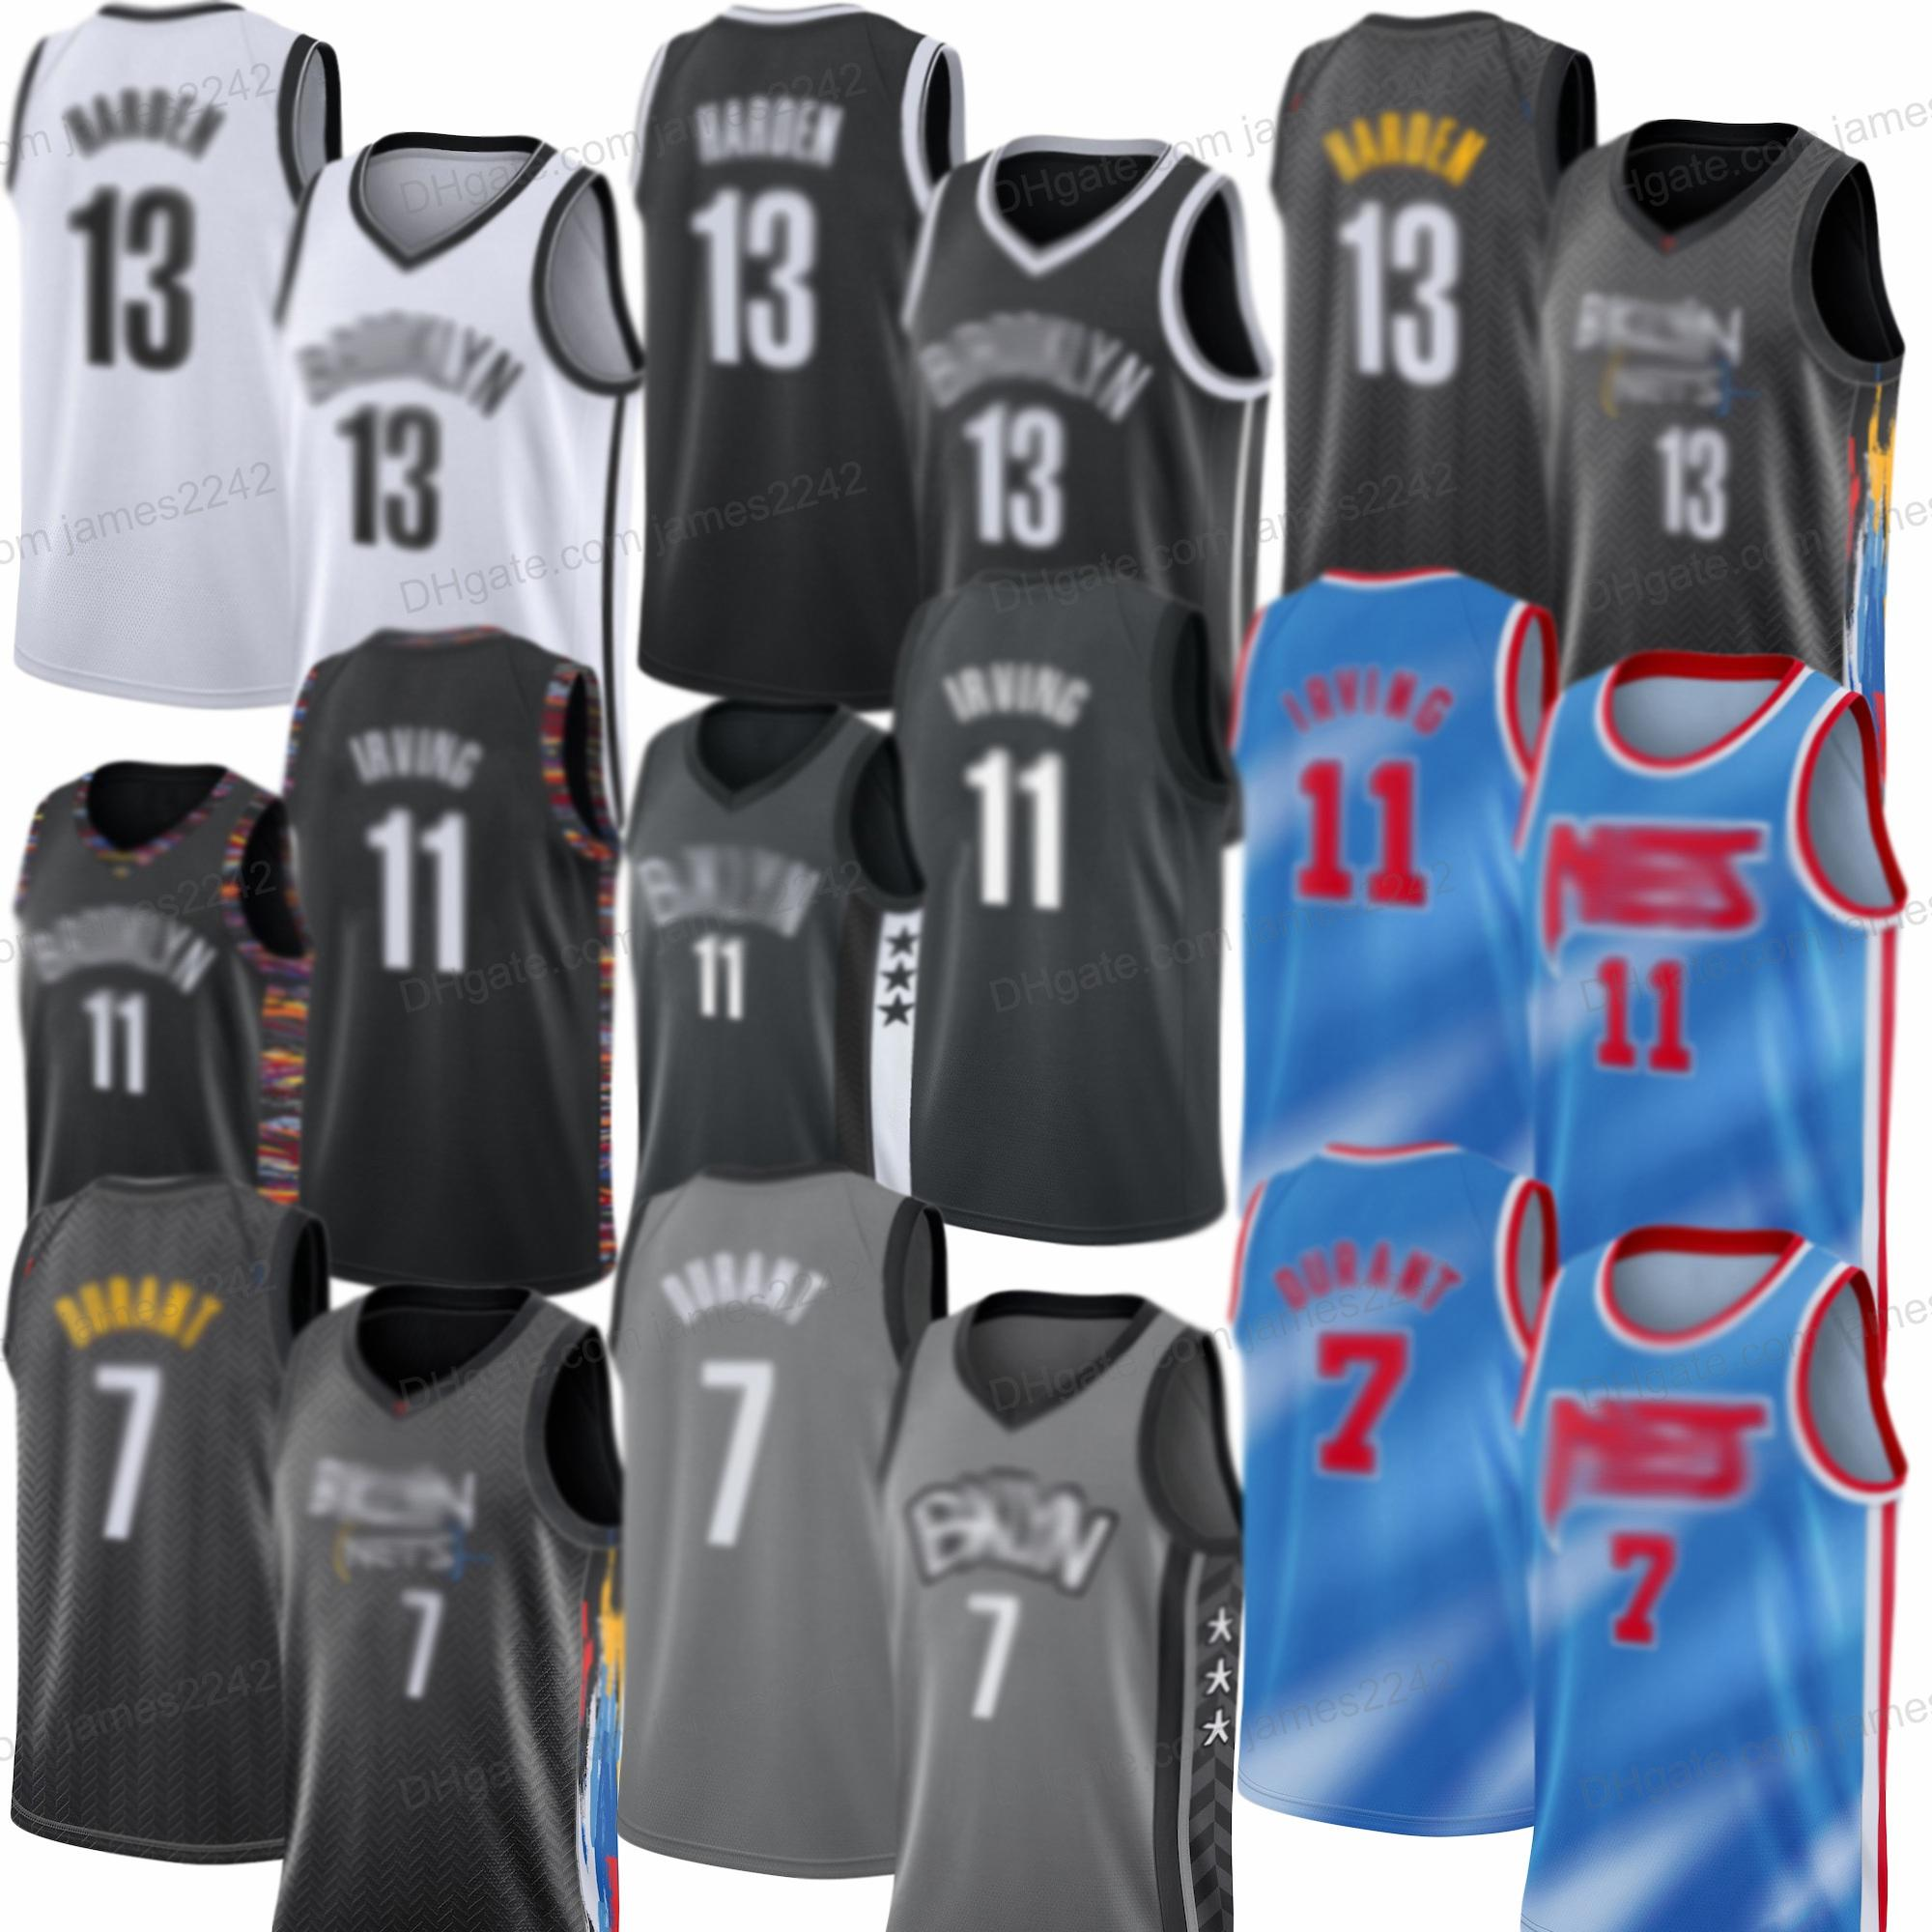 Nouveaux pas chers 13 Harden Kyrie 11 Mens Nett 2021 Kevin Neuf 7 Durant Brookllyn Jersey Basketball Jersey Coutsed Livraison Gratuite